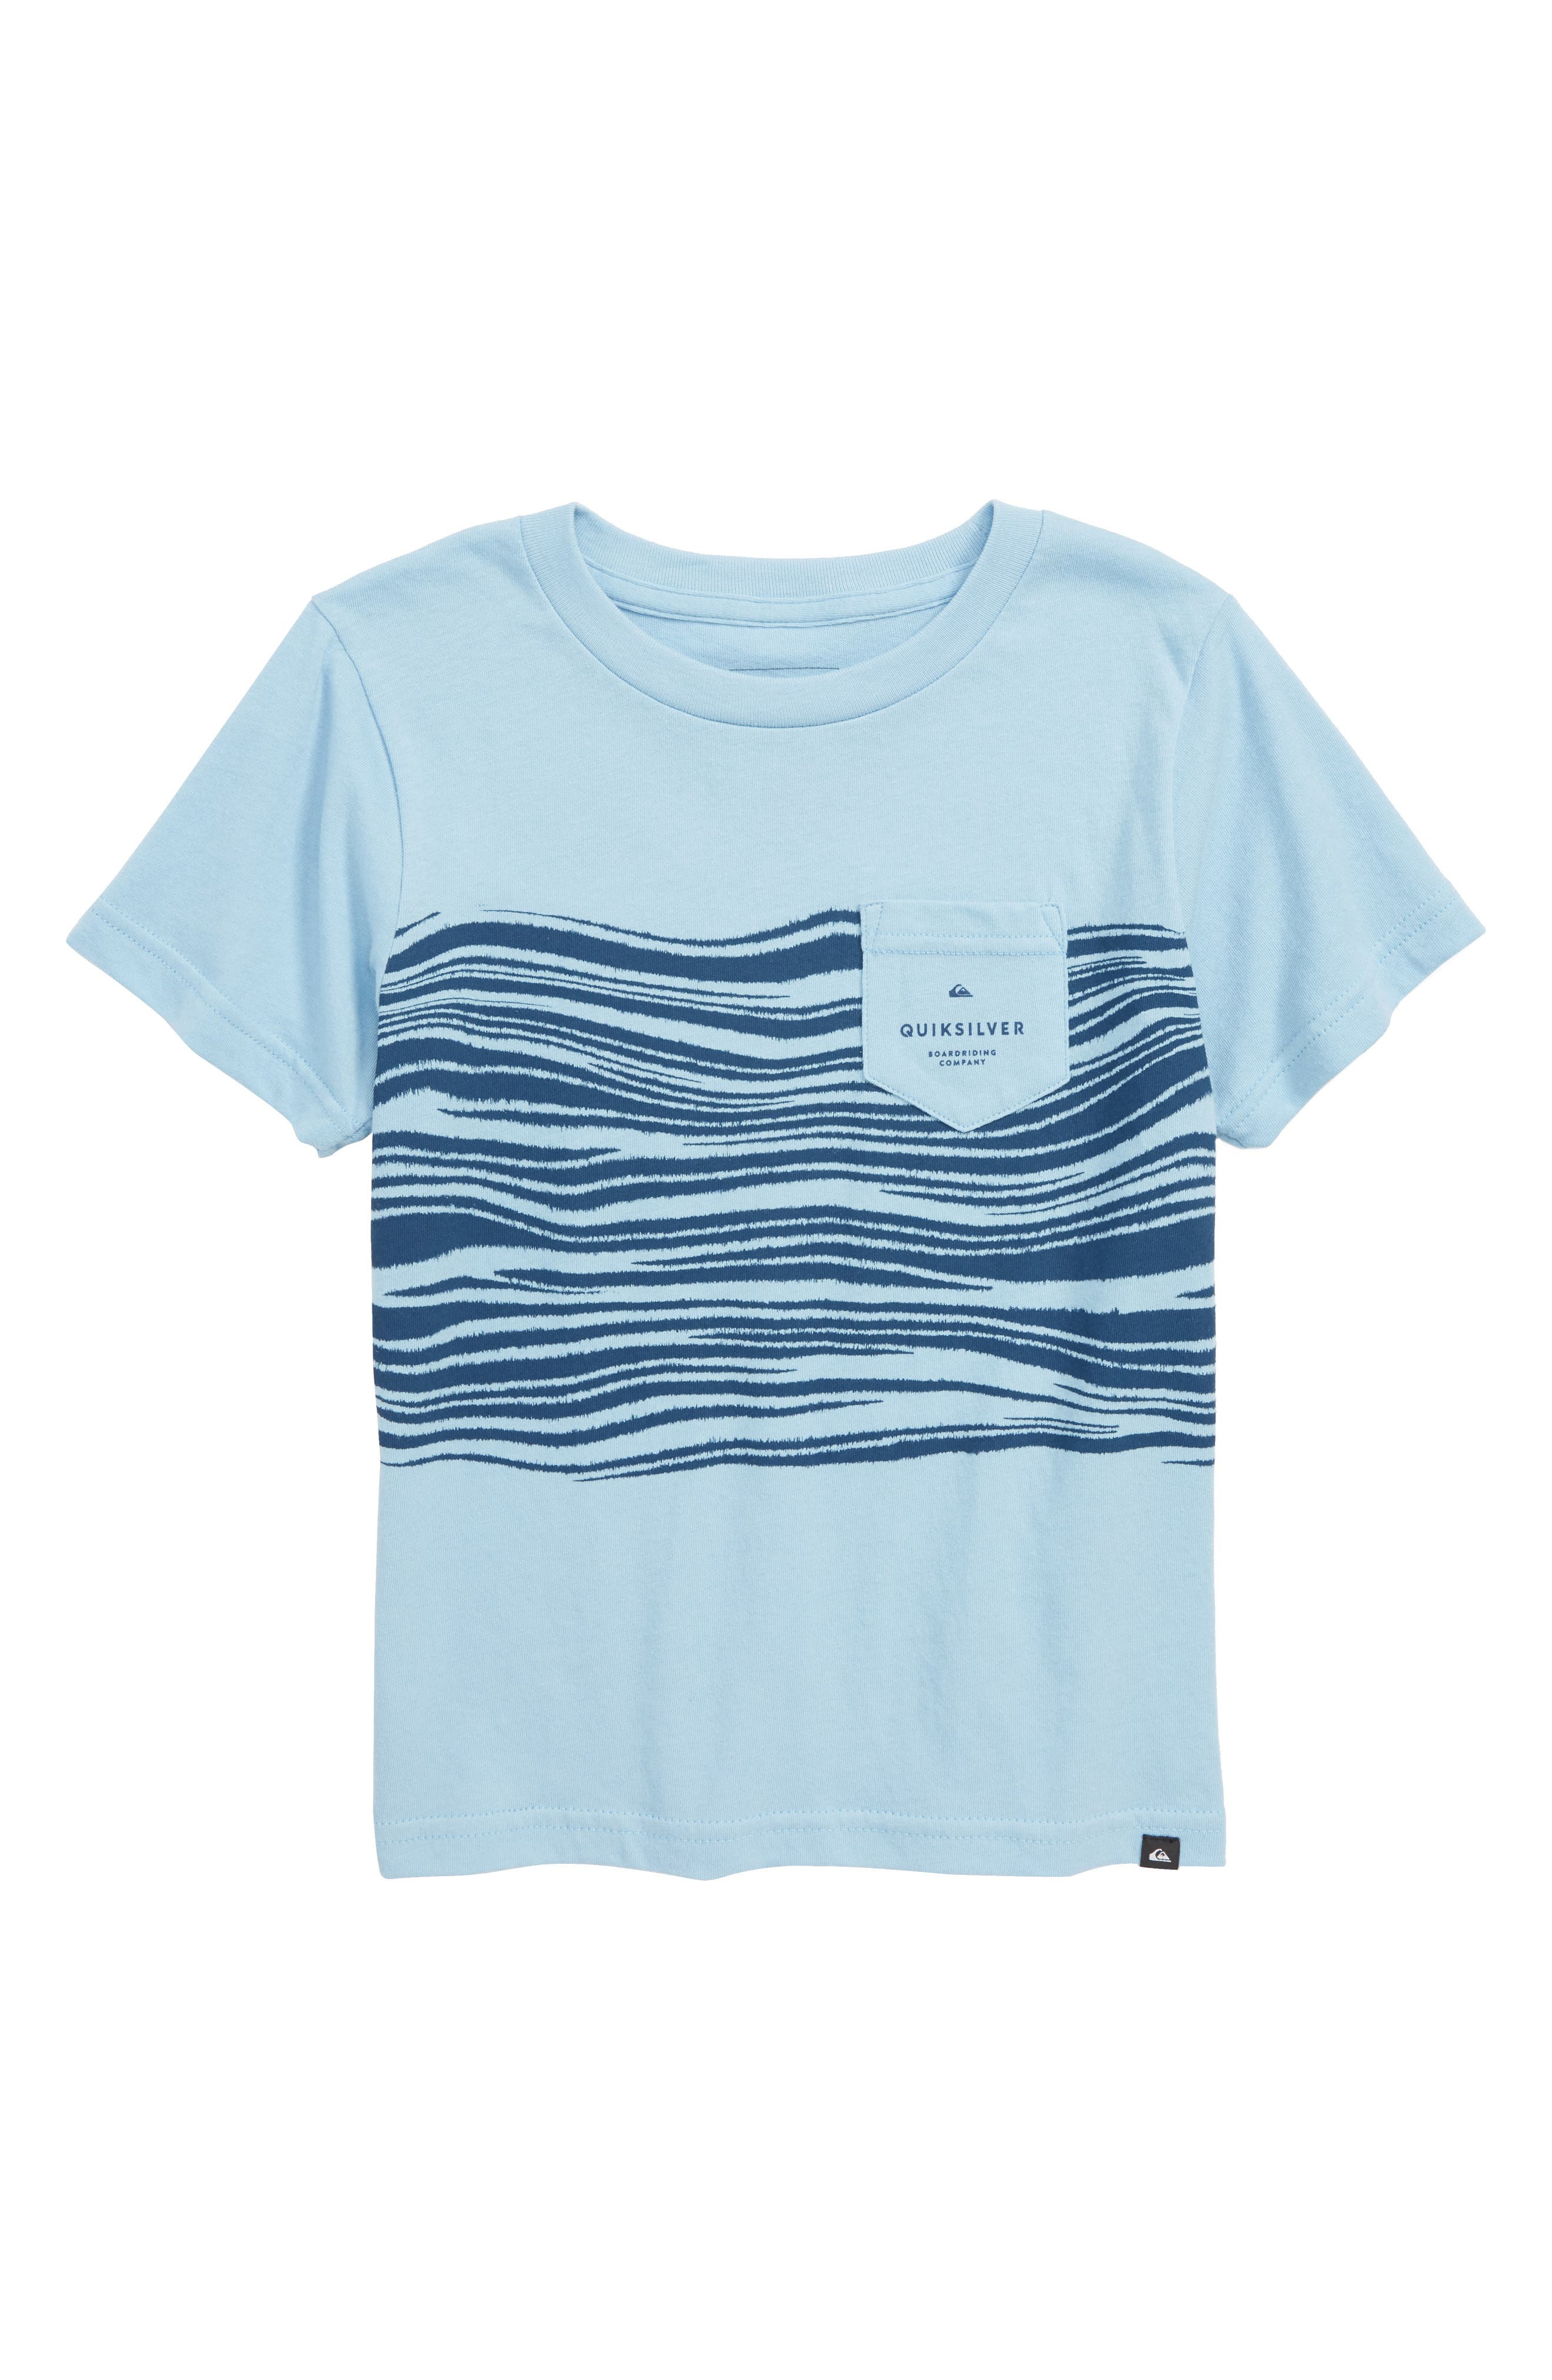 Quiksilver Zebra Zone Graphic T-Shirt (Toddler Boys & Little Boys)